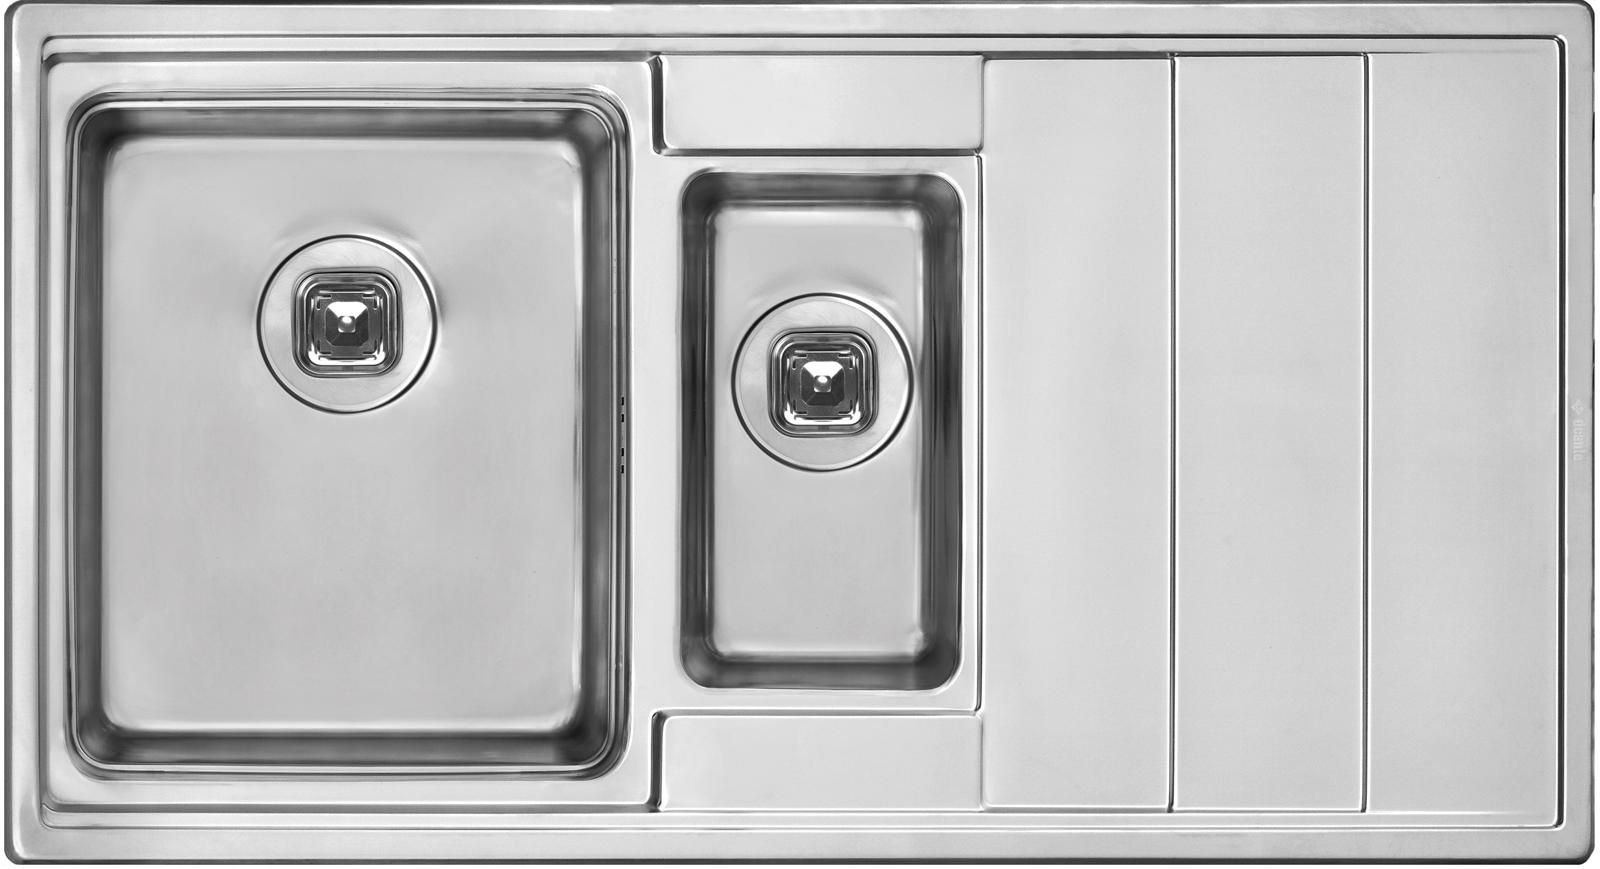 kitchen sinks stainless steel | stainless undermount sink ...